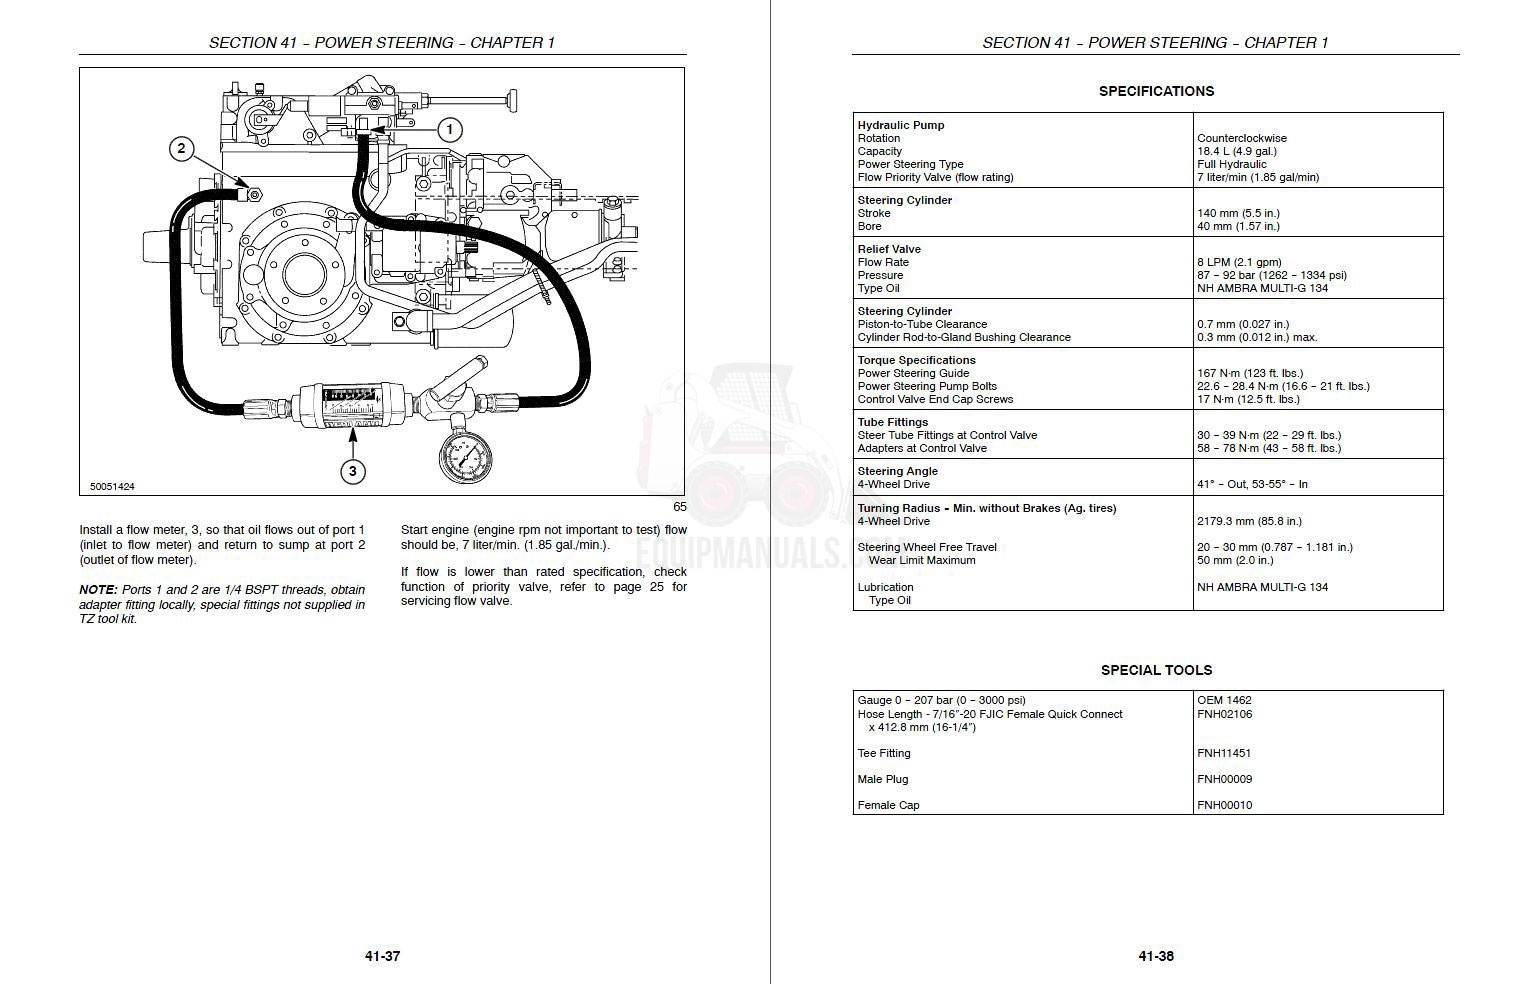 new holland ts110 wiring diagram example electrical wiring diagram \u2022 new holland tn55 wiring diagram new holland tz18da tz22da tz24da tz25da tractor repair manual rh equipmanuals com new holland ts100 ts110 new holland specs